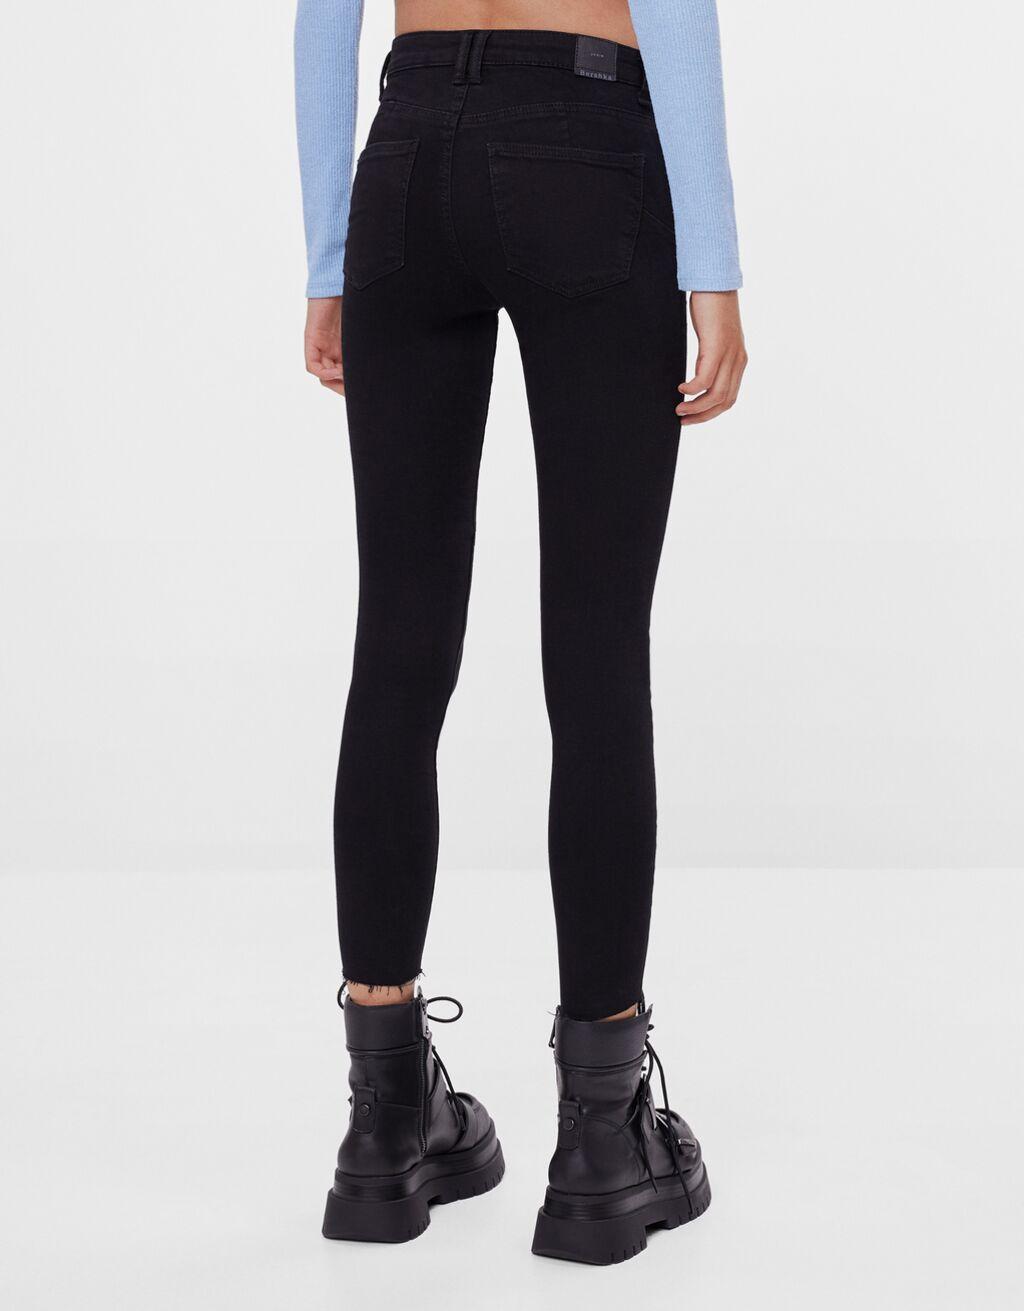 Mid-waist push-up jeans - Jeans - Woman